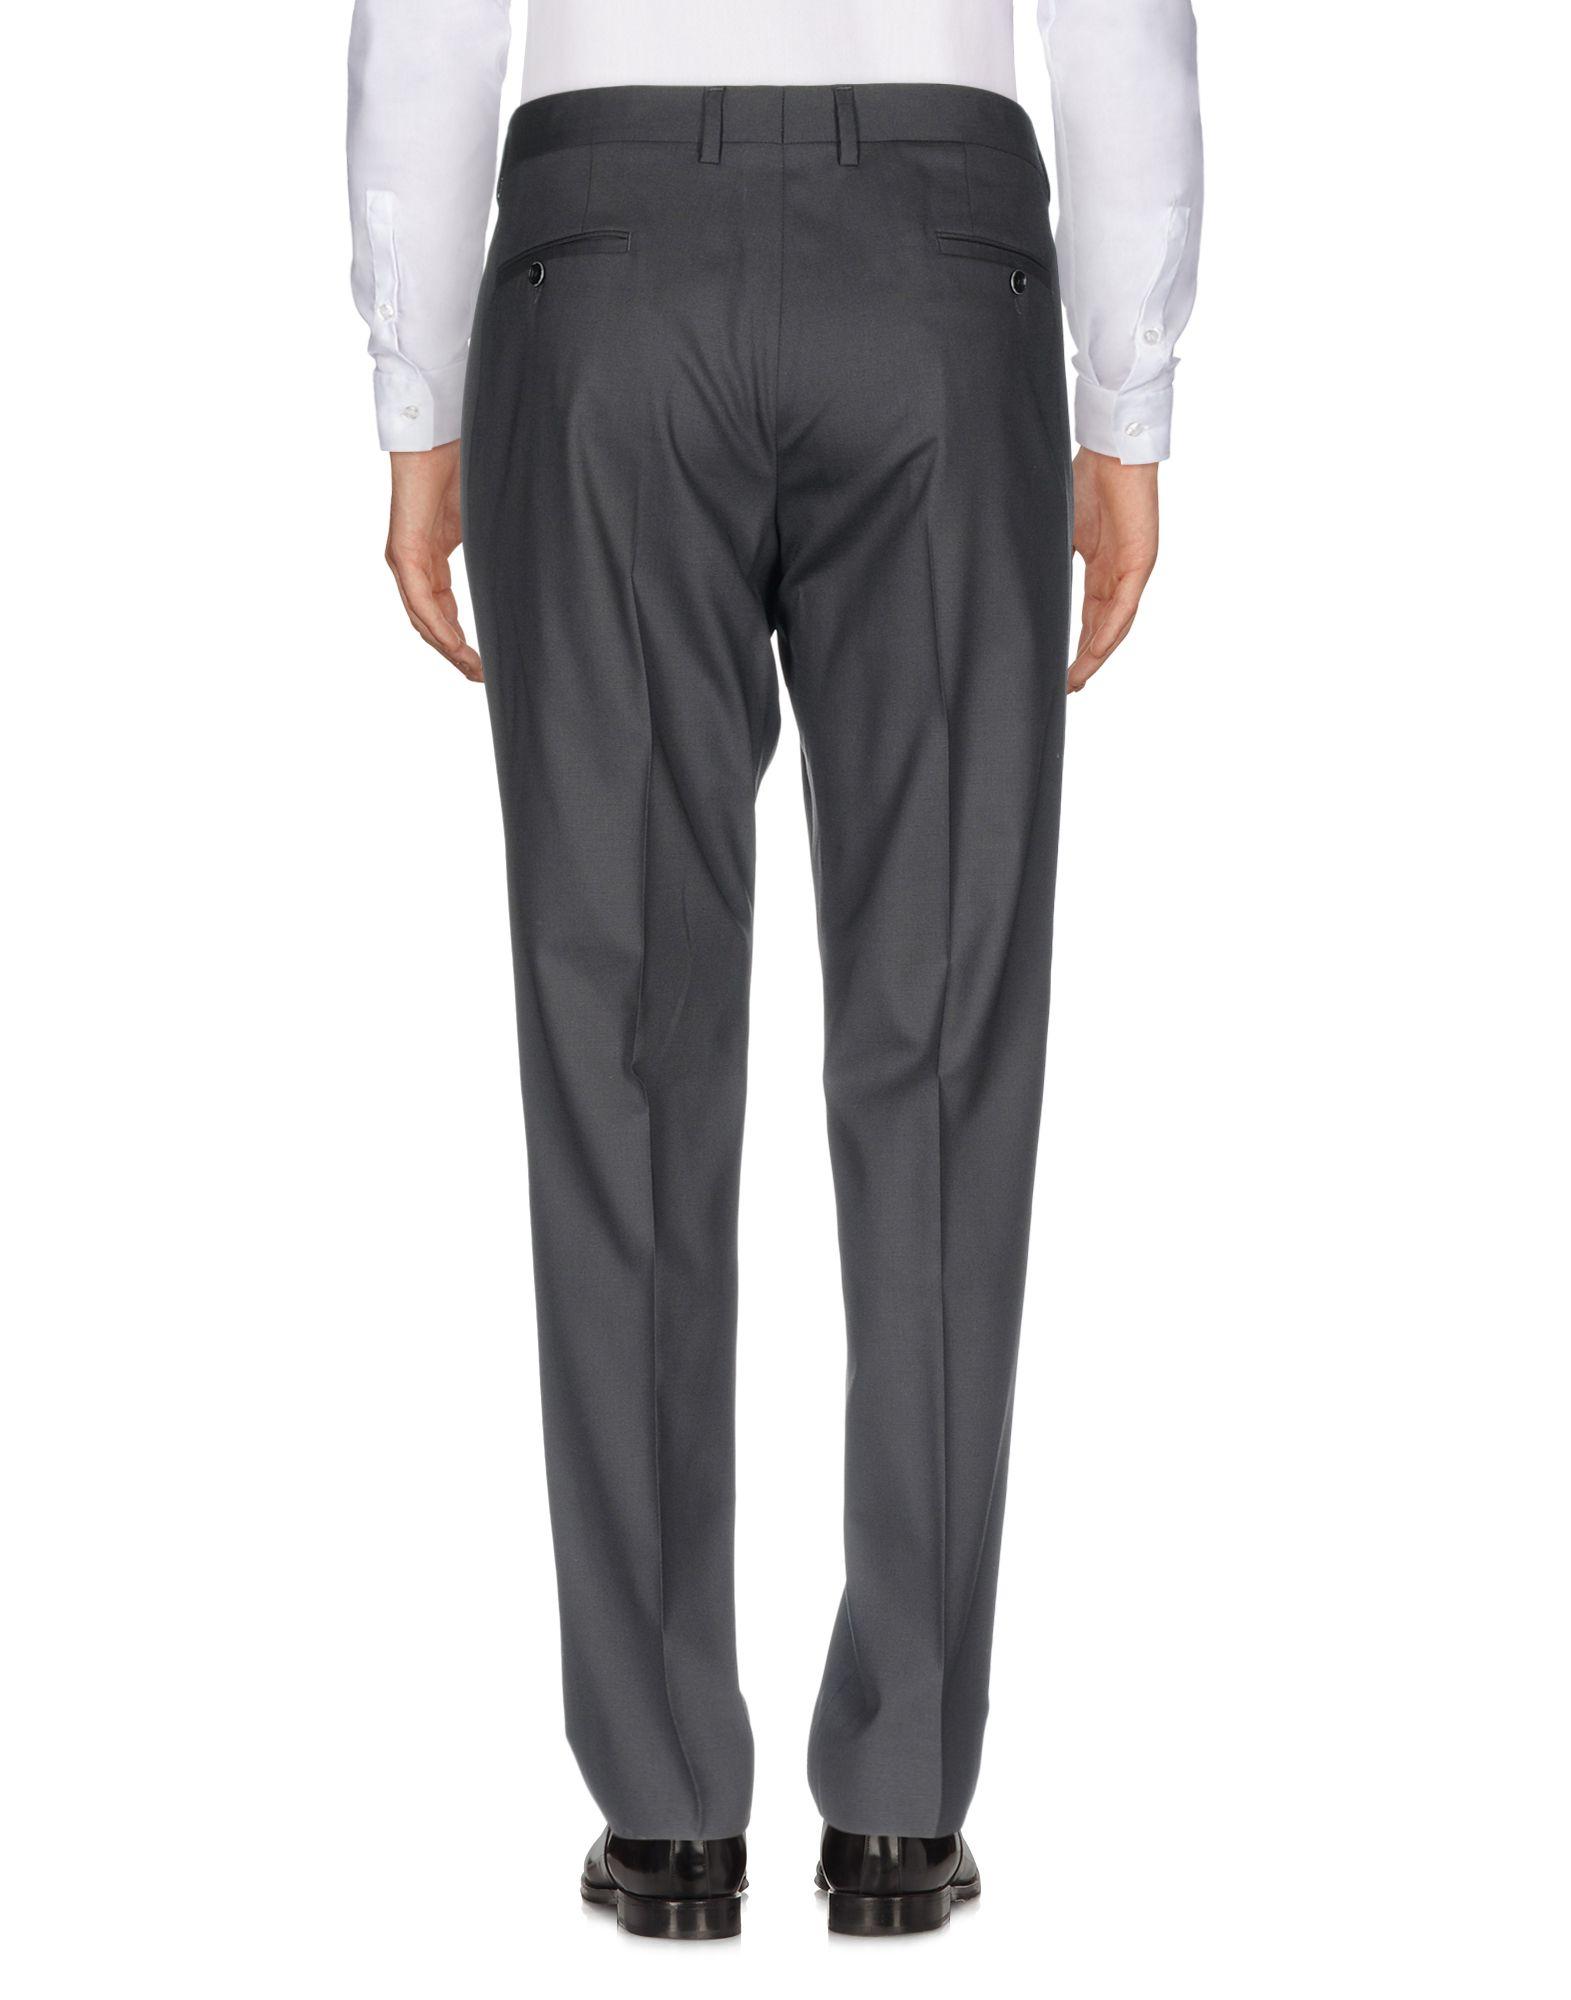 Pantalone Dolce & Gabbana Uomo 36964340DJ - 36964340DJ Uomo 5995ce